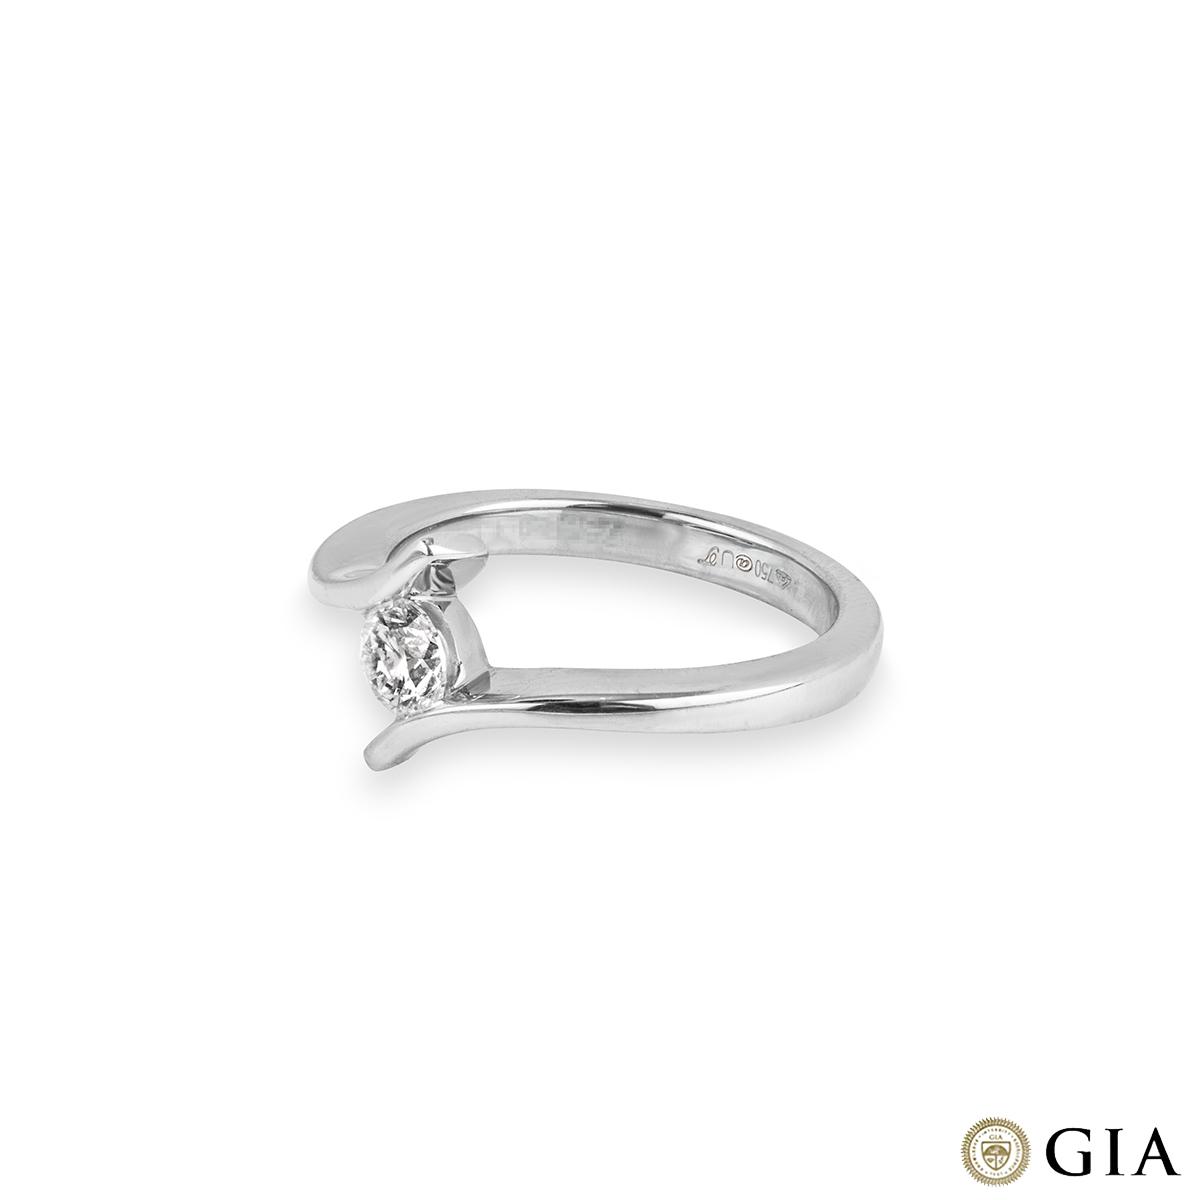 18k White Gold Round Brilliant Cut Diamond Ring 0.43ct F/VS1